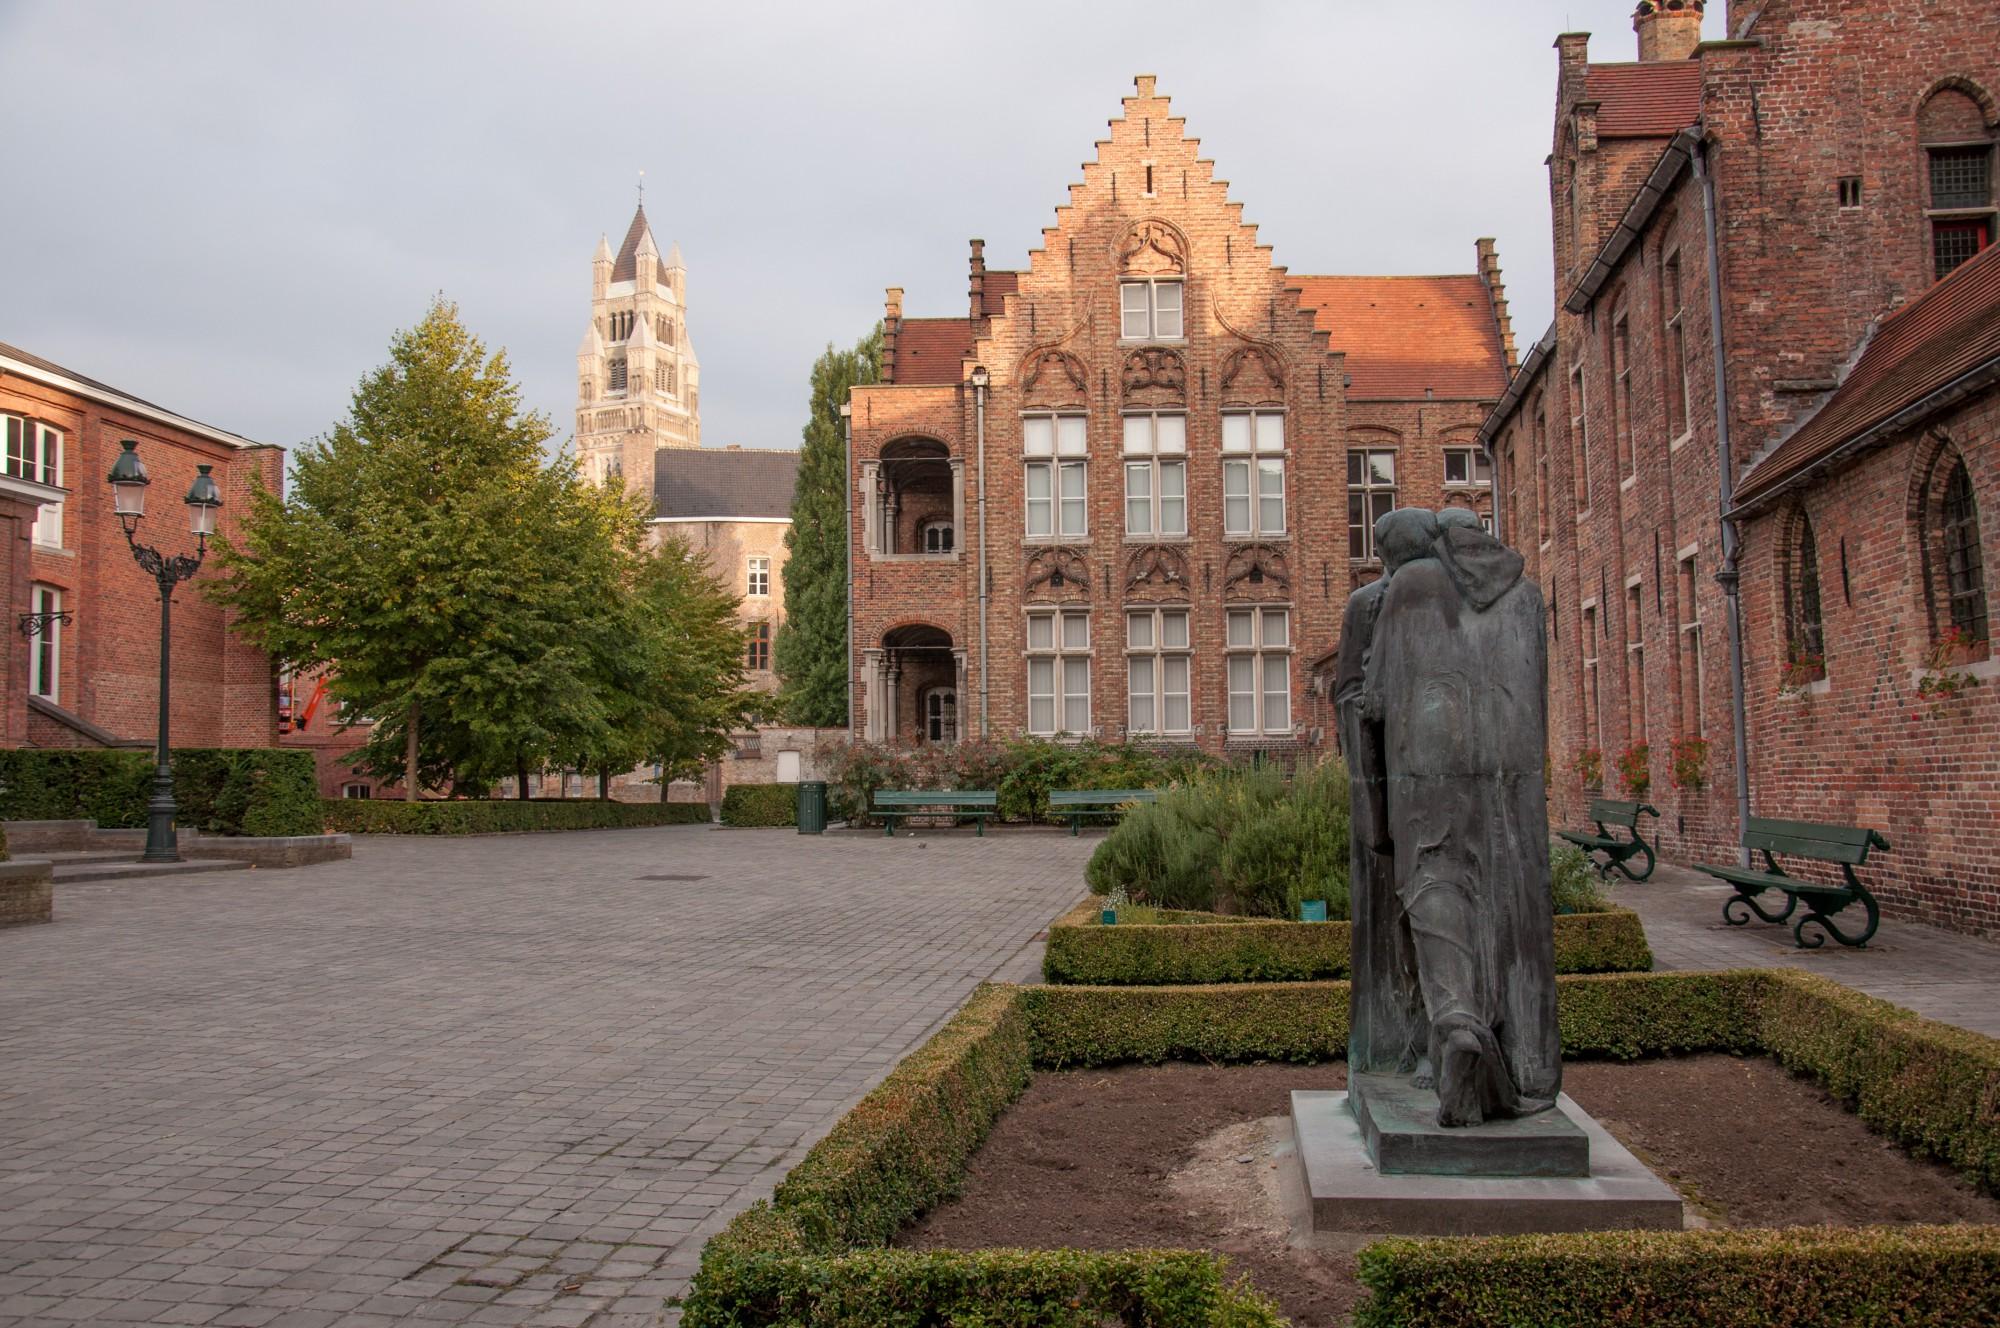 que ver brujas, Museo Memling, Sint-Janshospitaal